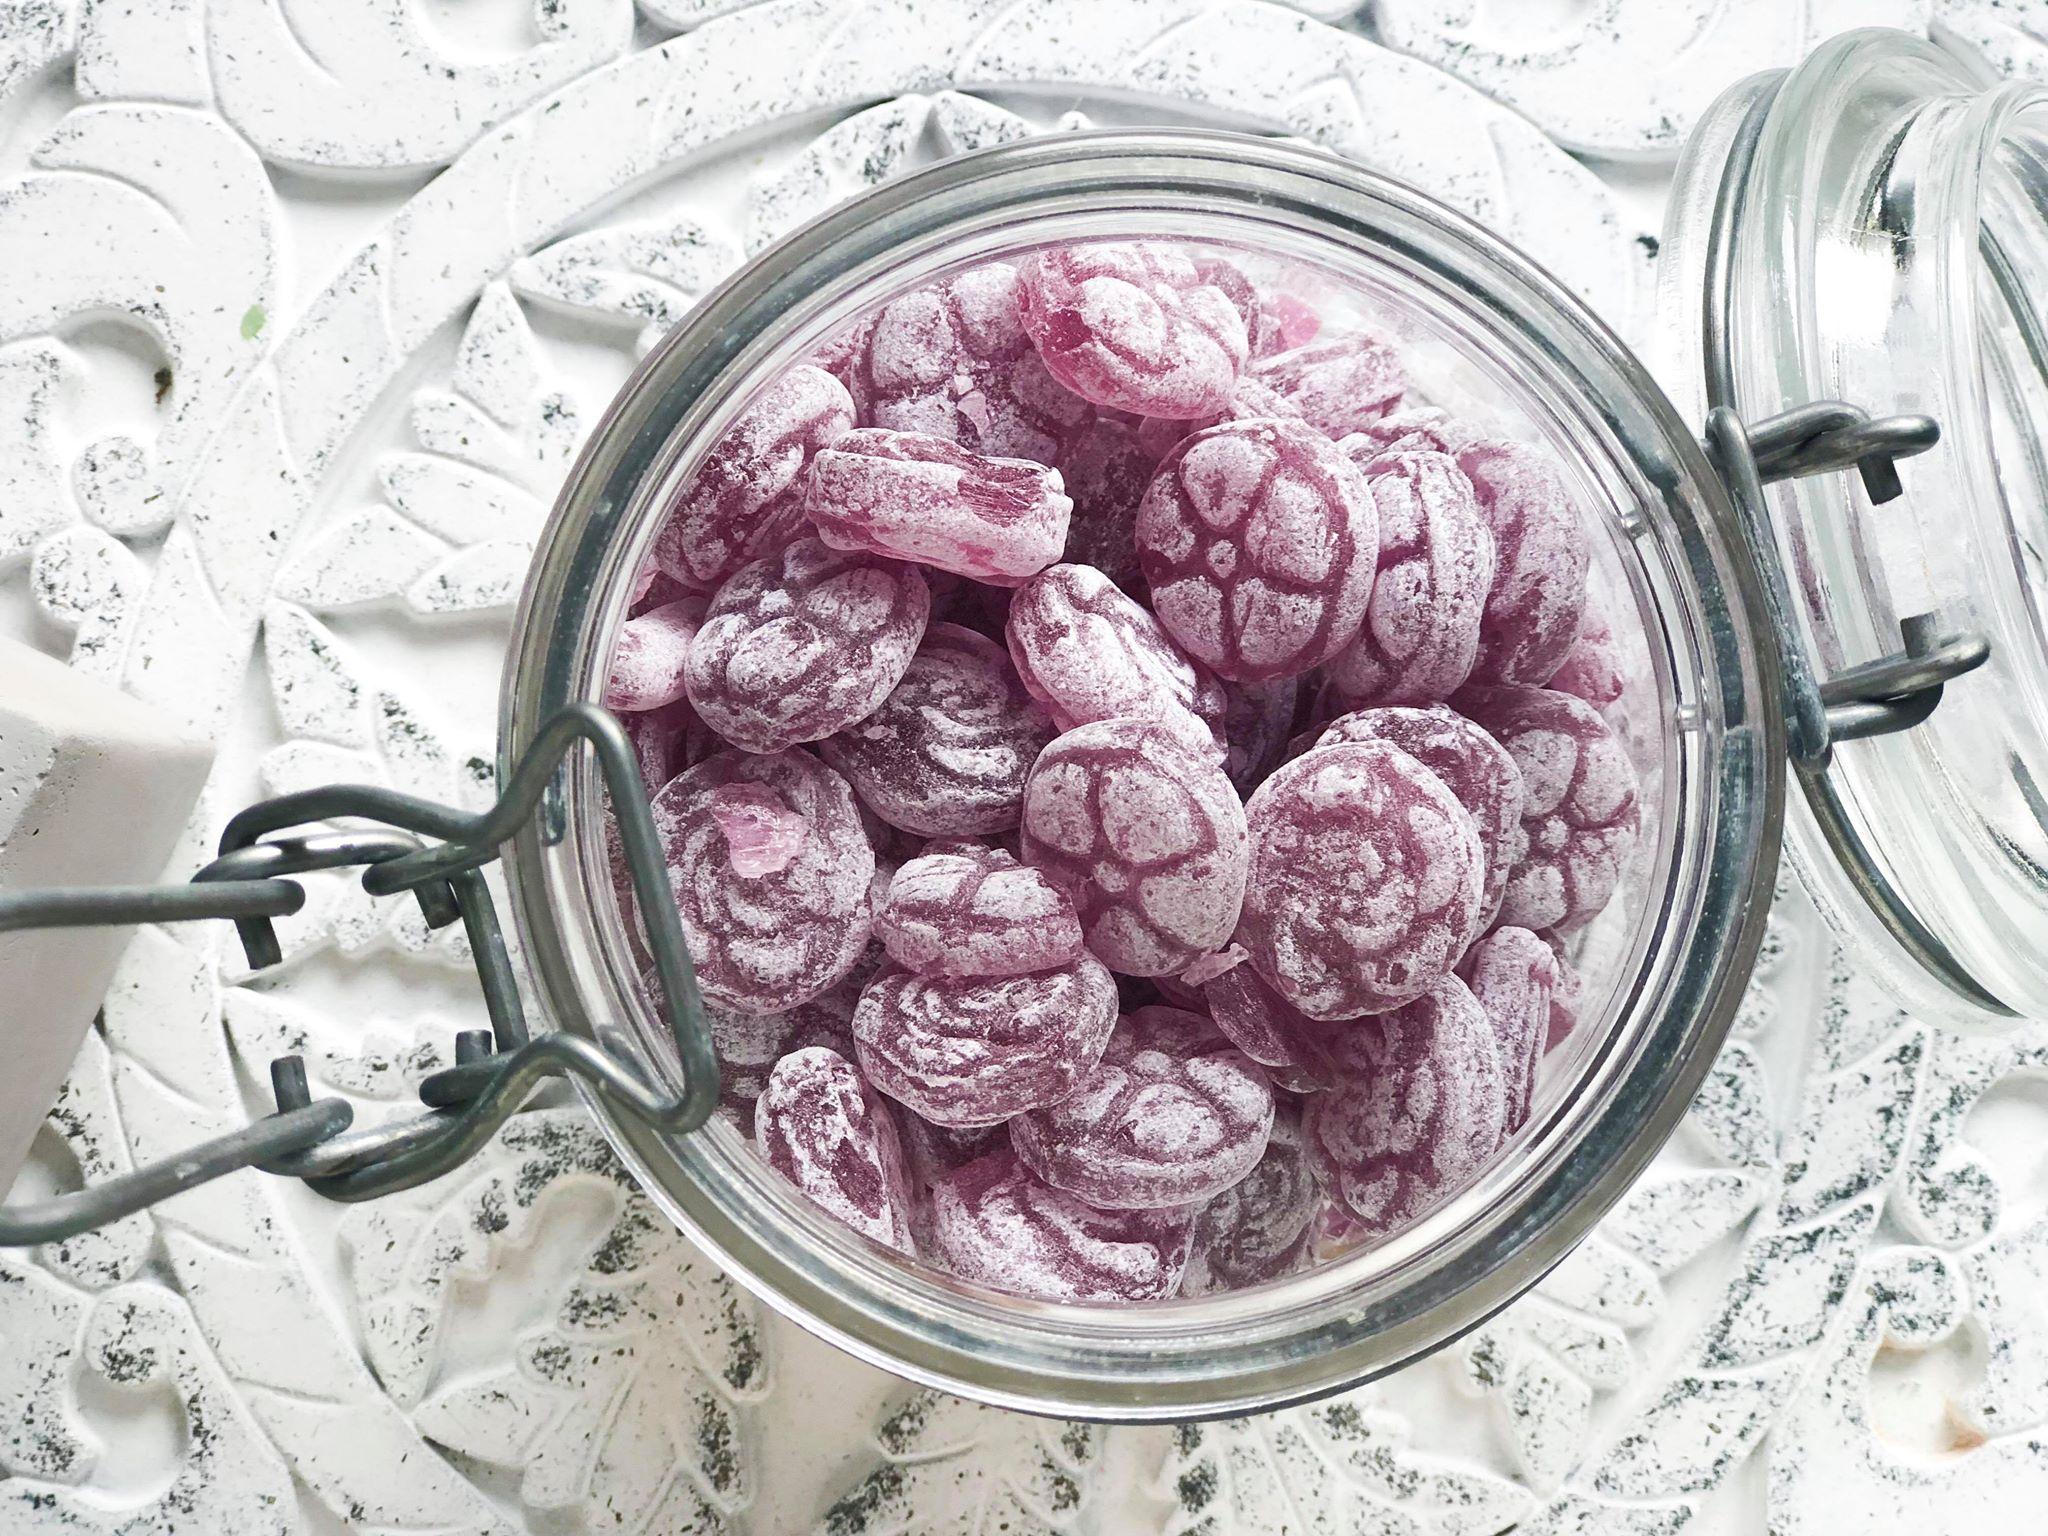 les violettes gicopa